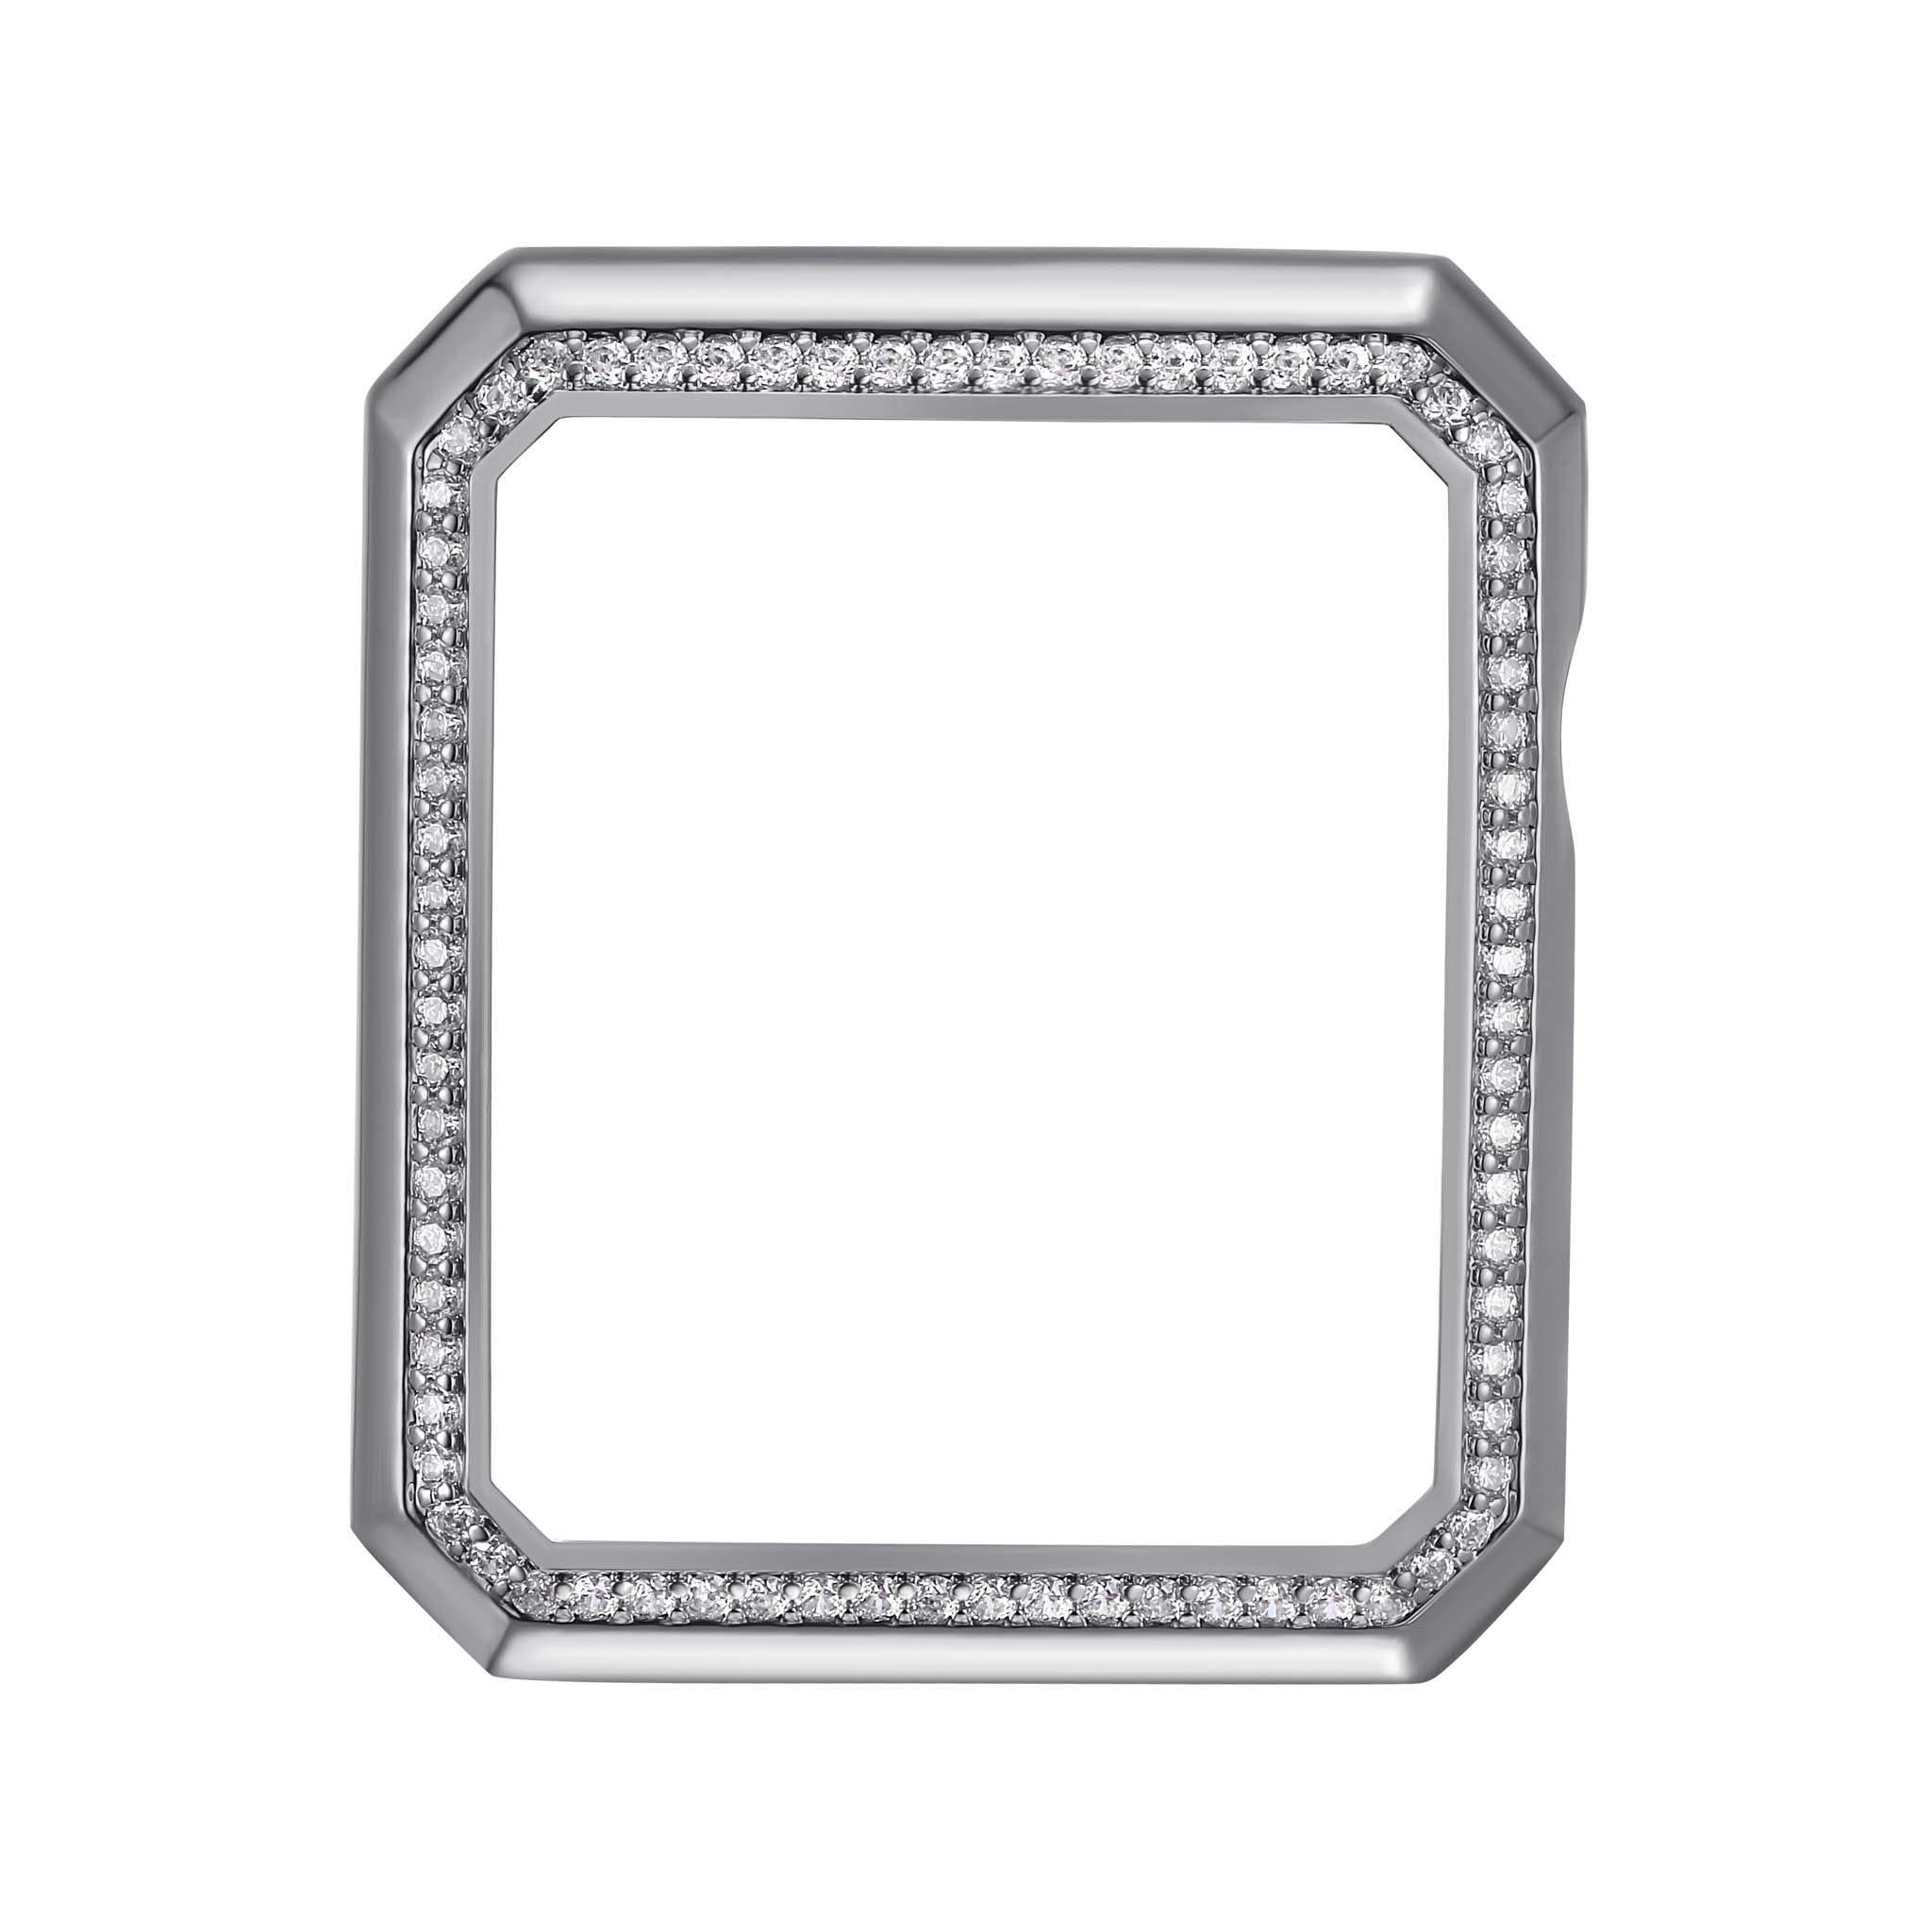 Silver Rhodium Plated Bronze Deco Halo Jewelry-Style Apple Watch Case with Swarovski Zirconia CZ Border - Small (Fits 38mm iWatch)